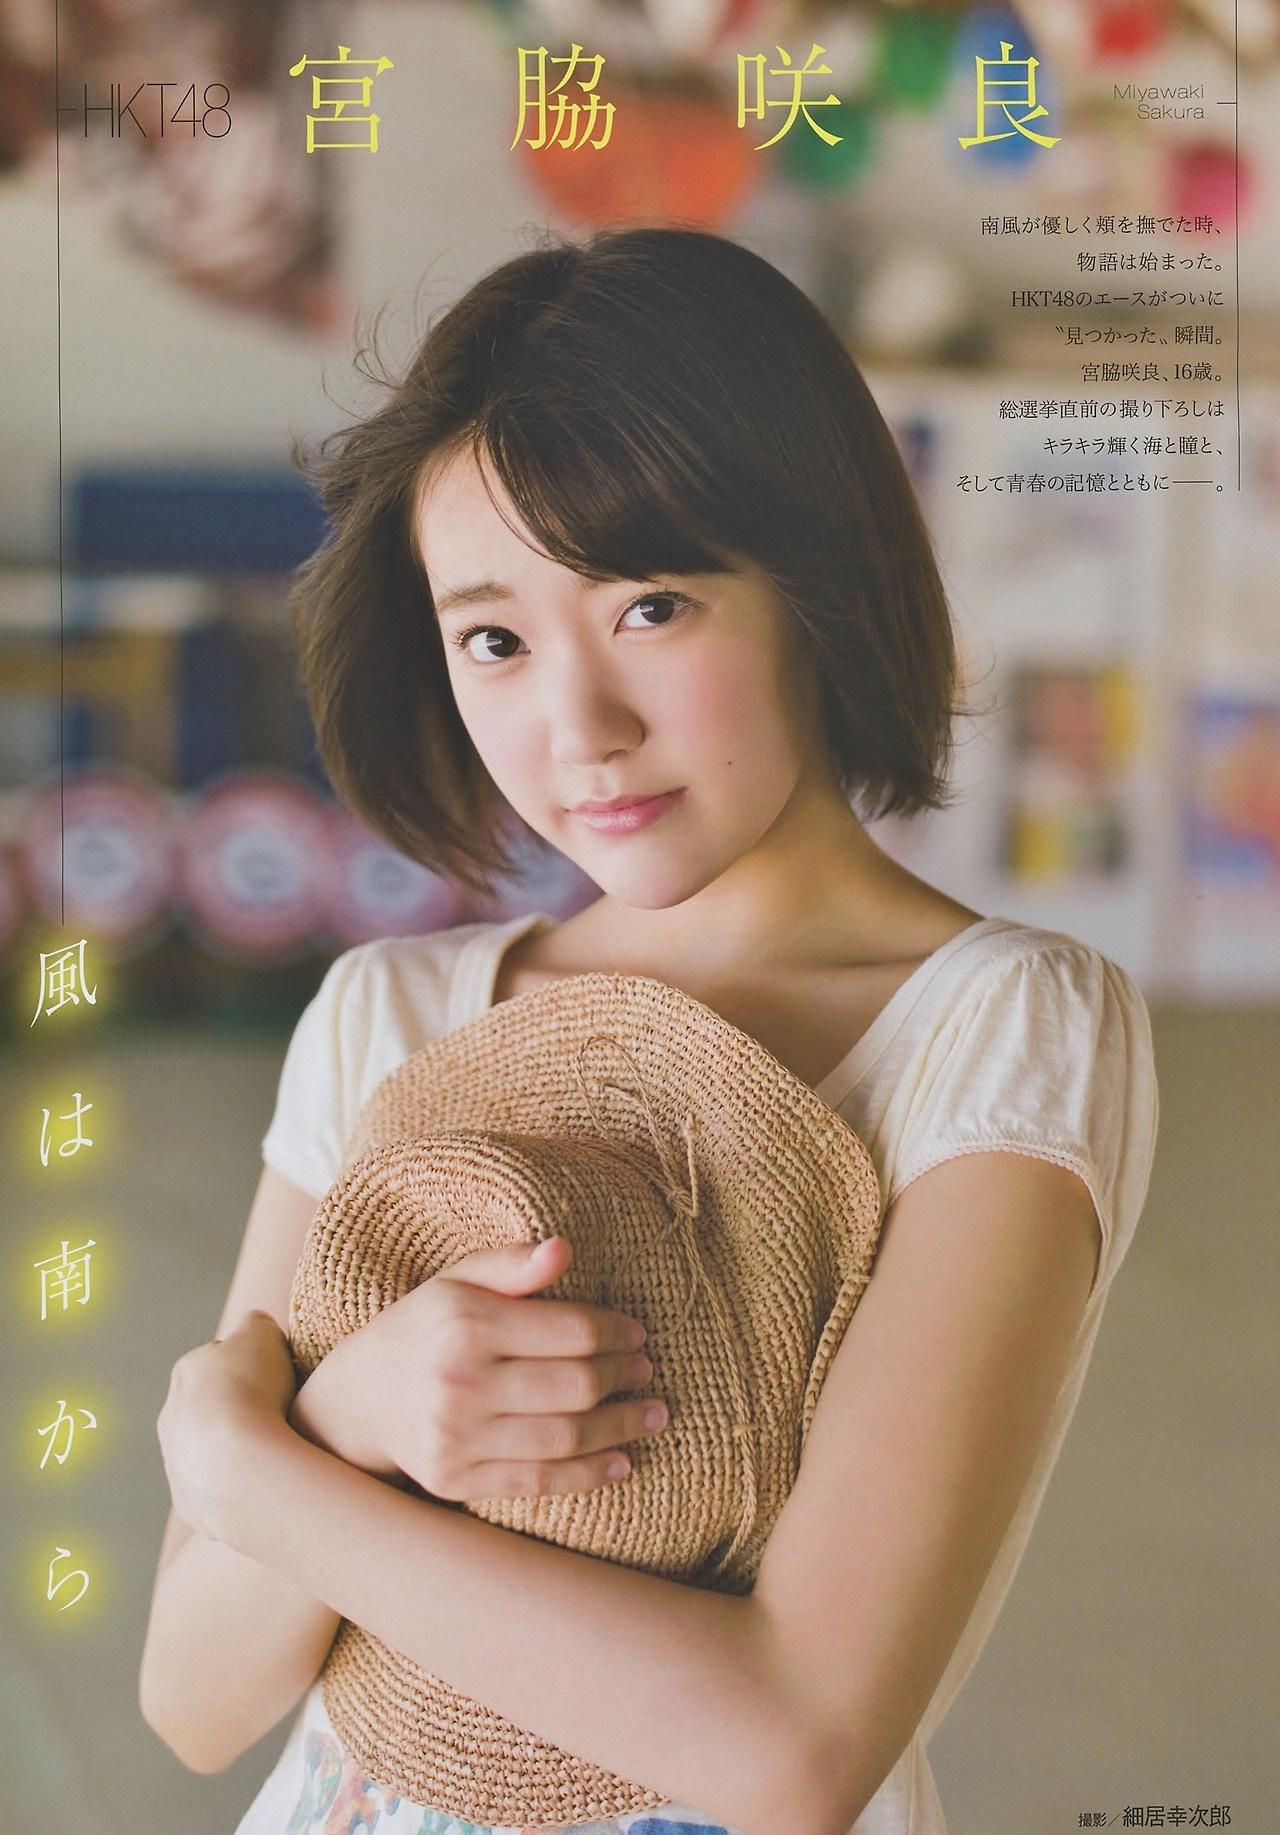 Miyawaki Sakura Hkt48 Asiachan Kpop Image Board